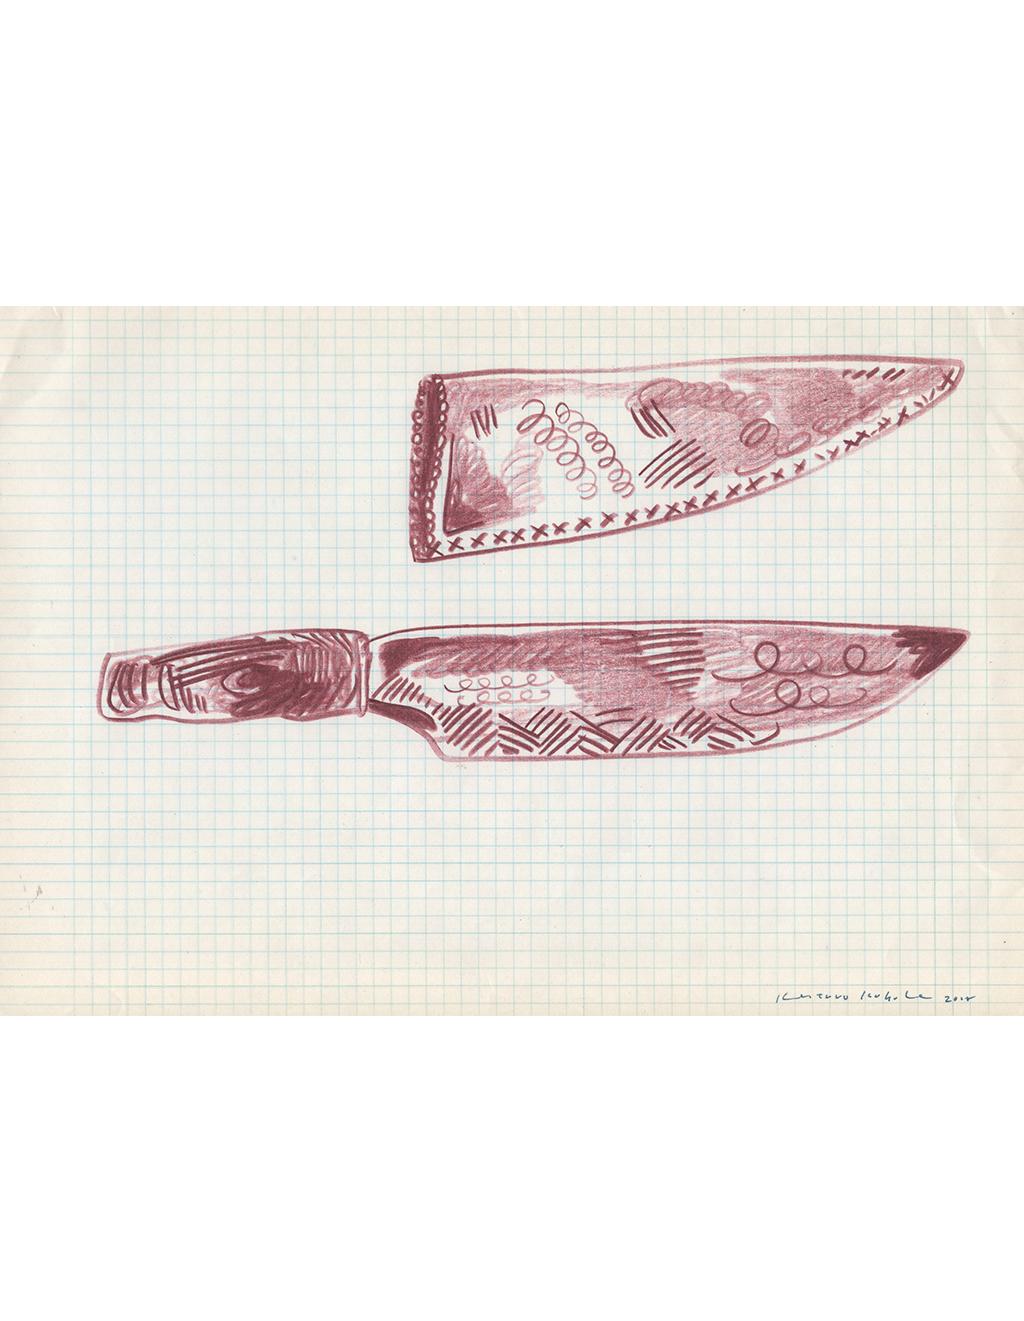 Drawing - Knives,   2018  29.5cm x 21cm  Colour pencils on paper